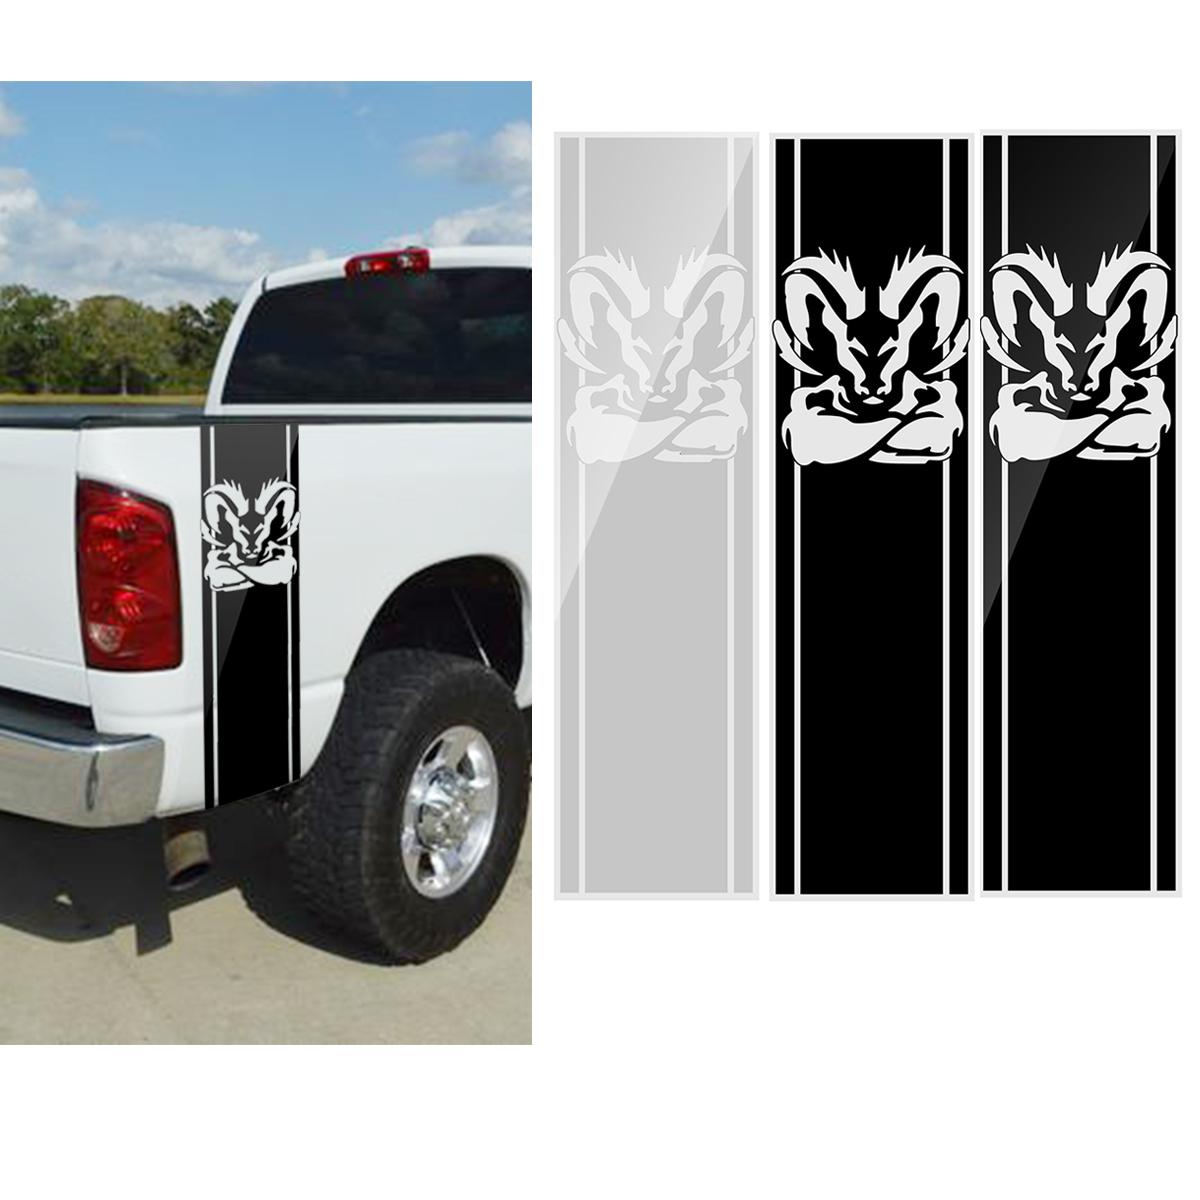 97x 25CM Car Stripe Racing Stickers PVC Decals for Dodge Ram 1500 2500 3500 5.7L DS011